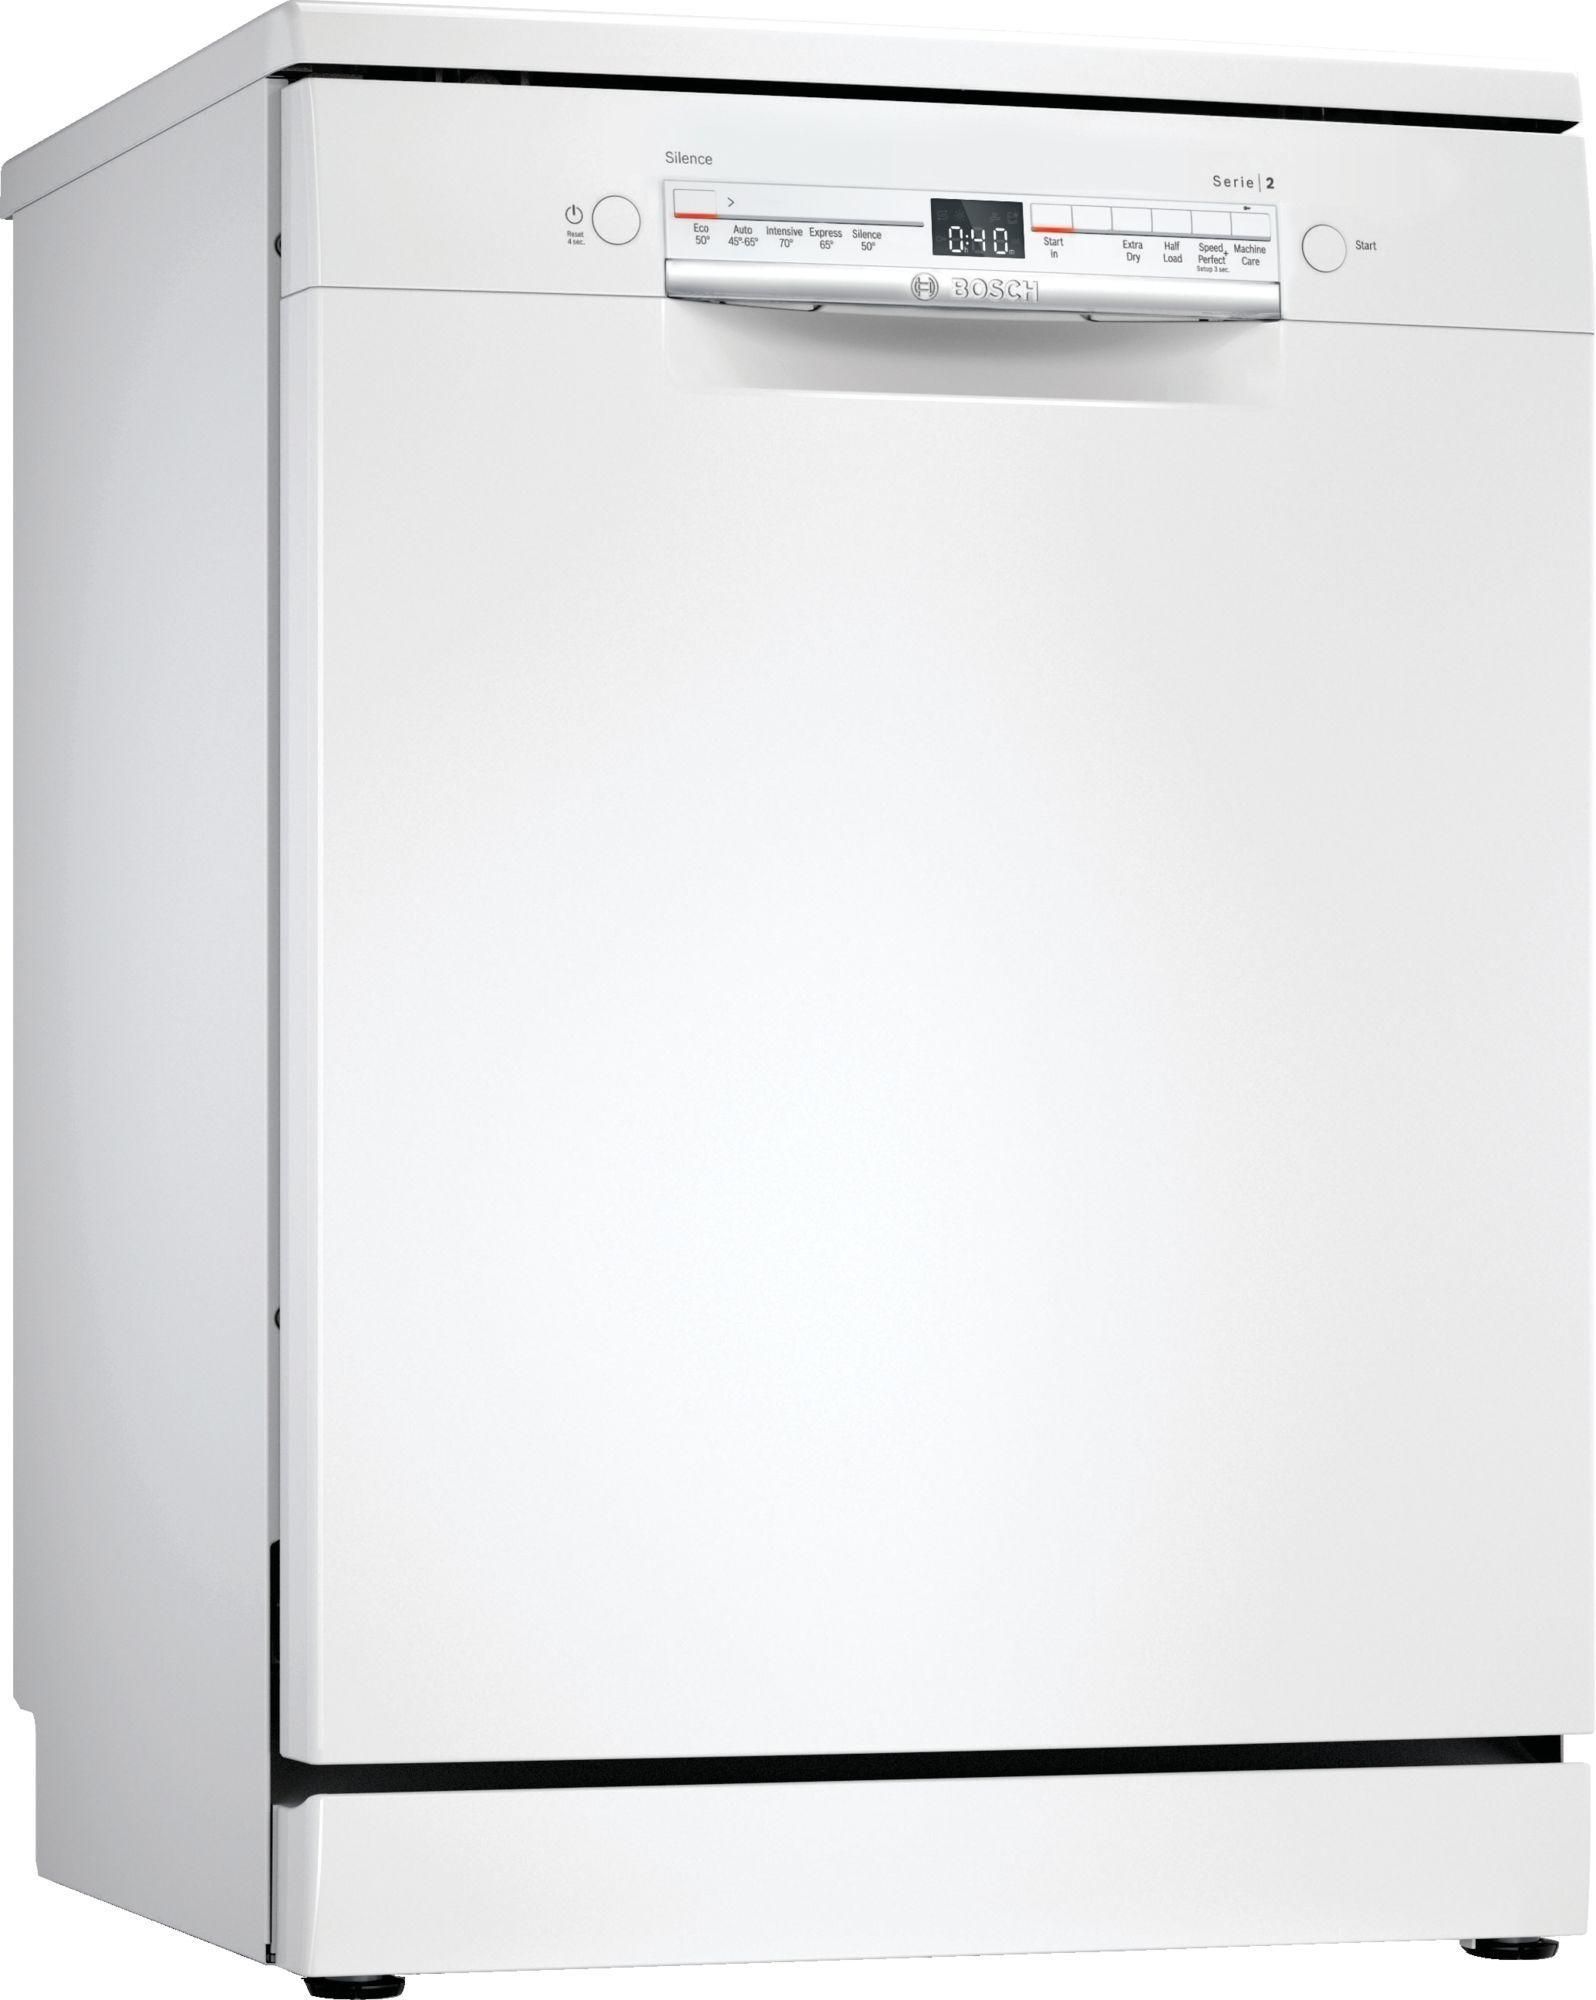 Image of Serie 2 SGS2HVW66G 60cm Standard Dishwasher | White